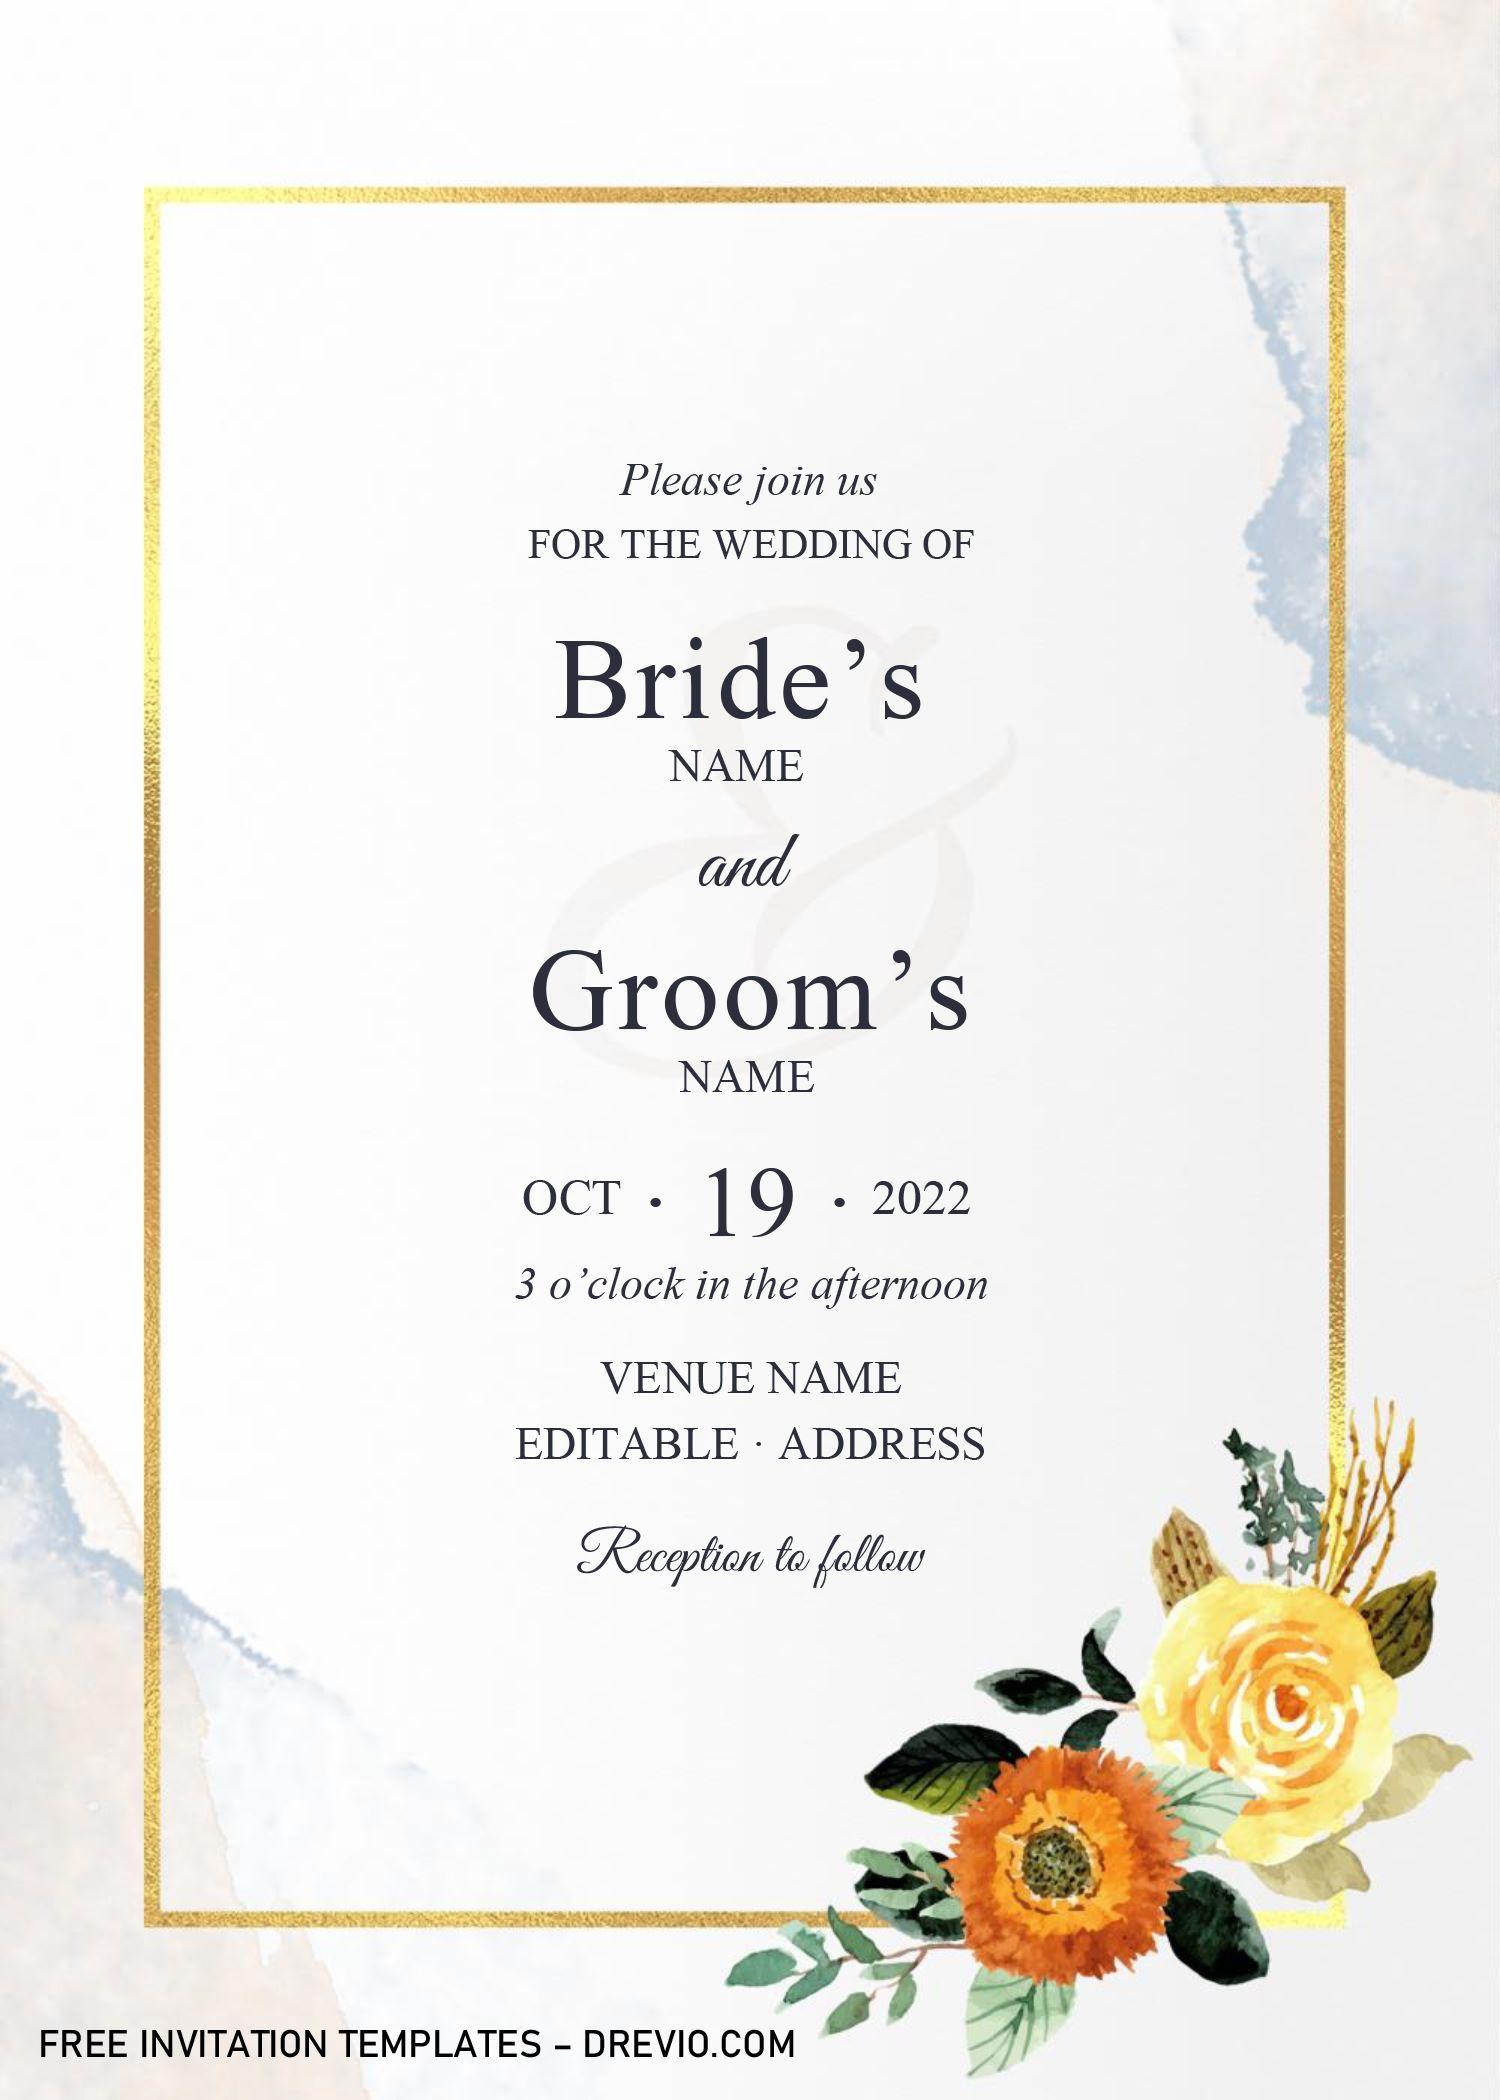 Golden Frame Wedding Invitation Templates Editable With Microsoft Word Wedding Invitation Templates Free Printable Birthday Invitations Invitation Template